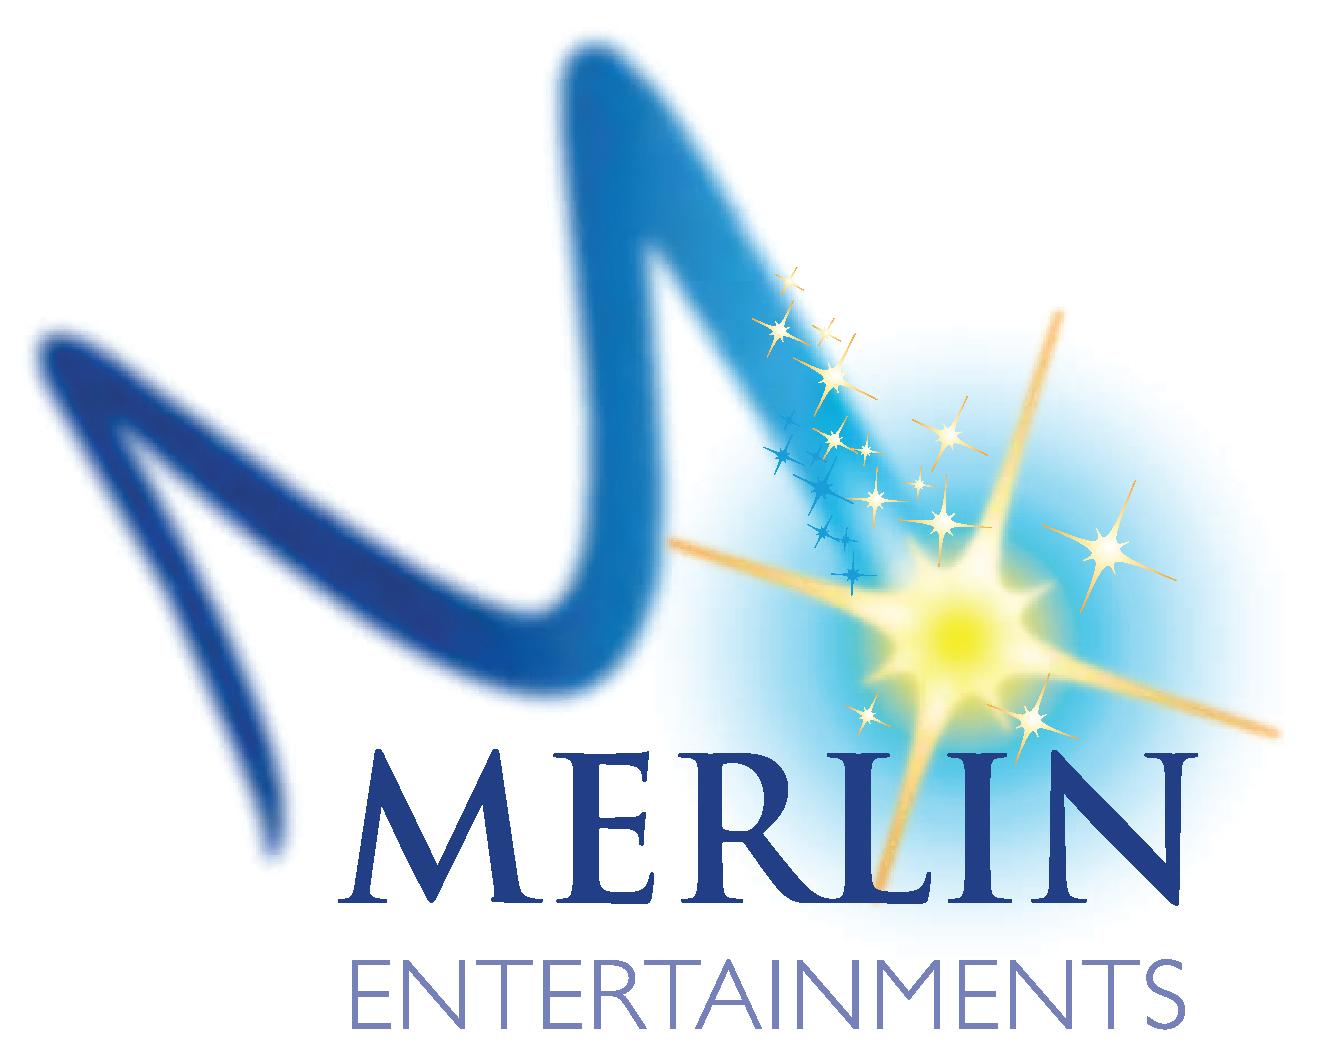 Merlin Entertainment